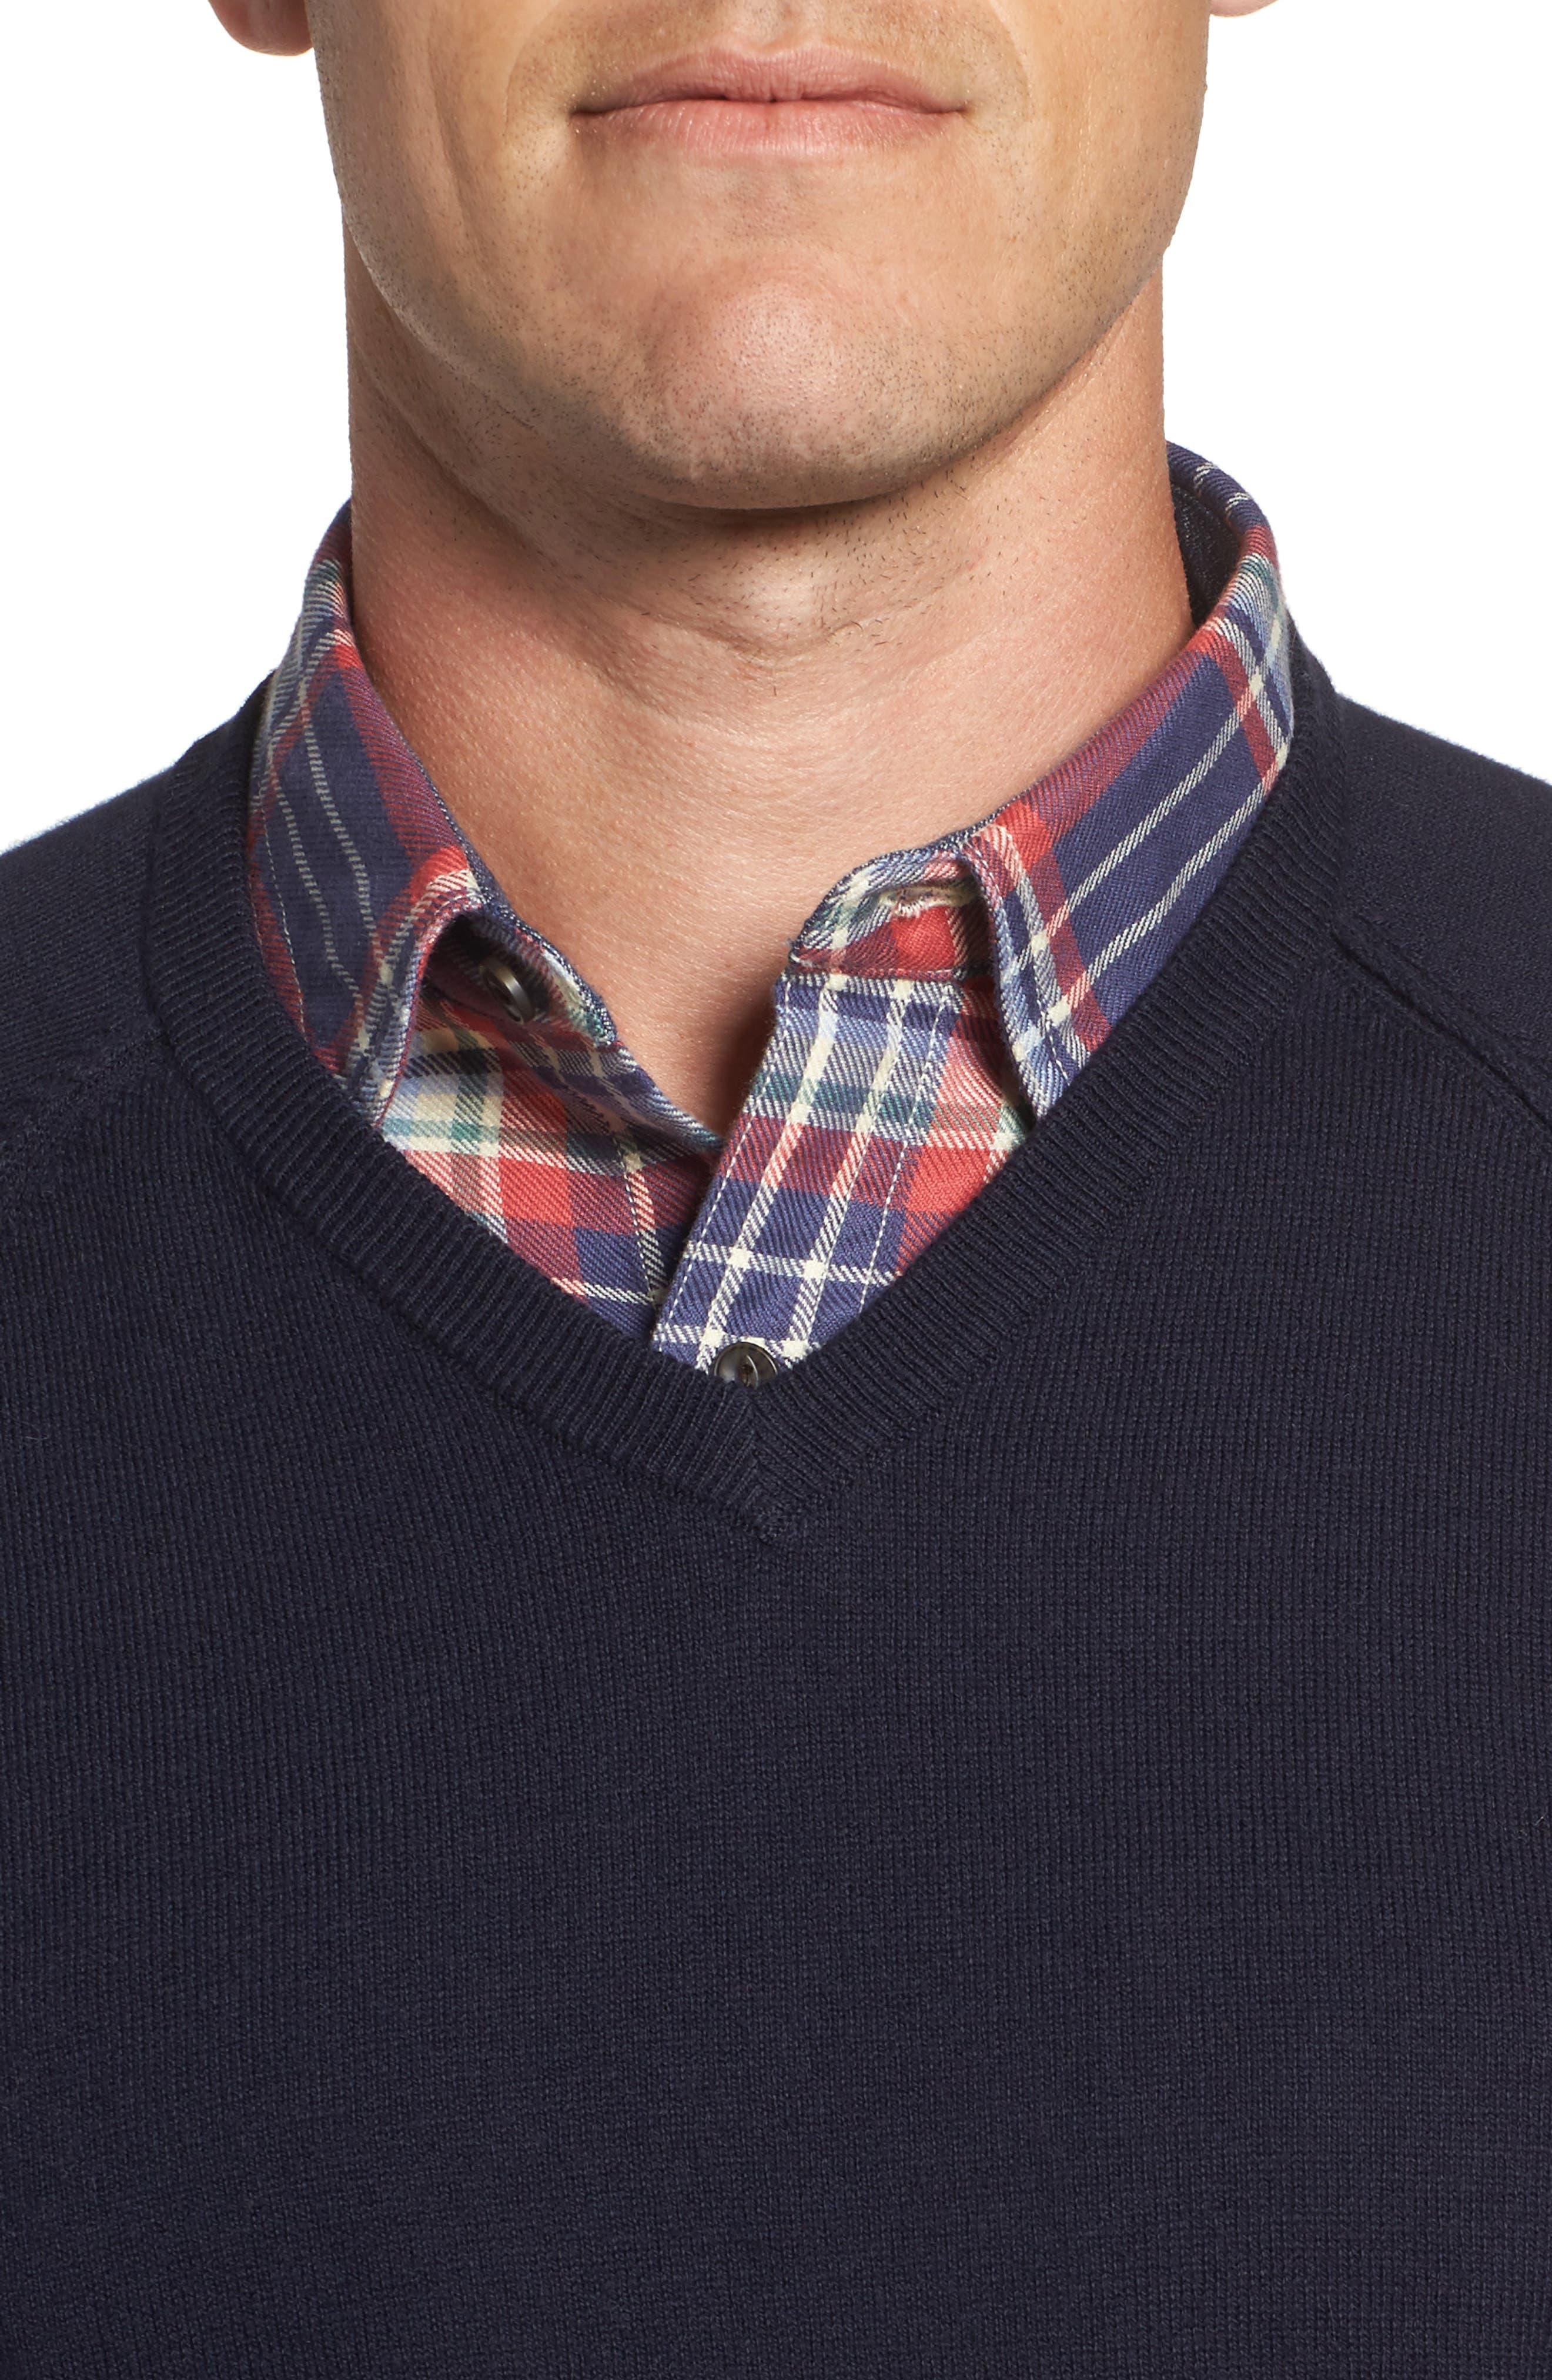 Saddle Shoulder Cotton & Cashmere V-Neck Sweater,                             Alternate thumbnail 4, color,                             Navy Night